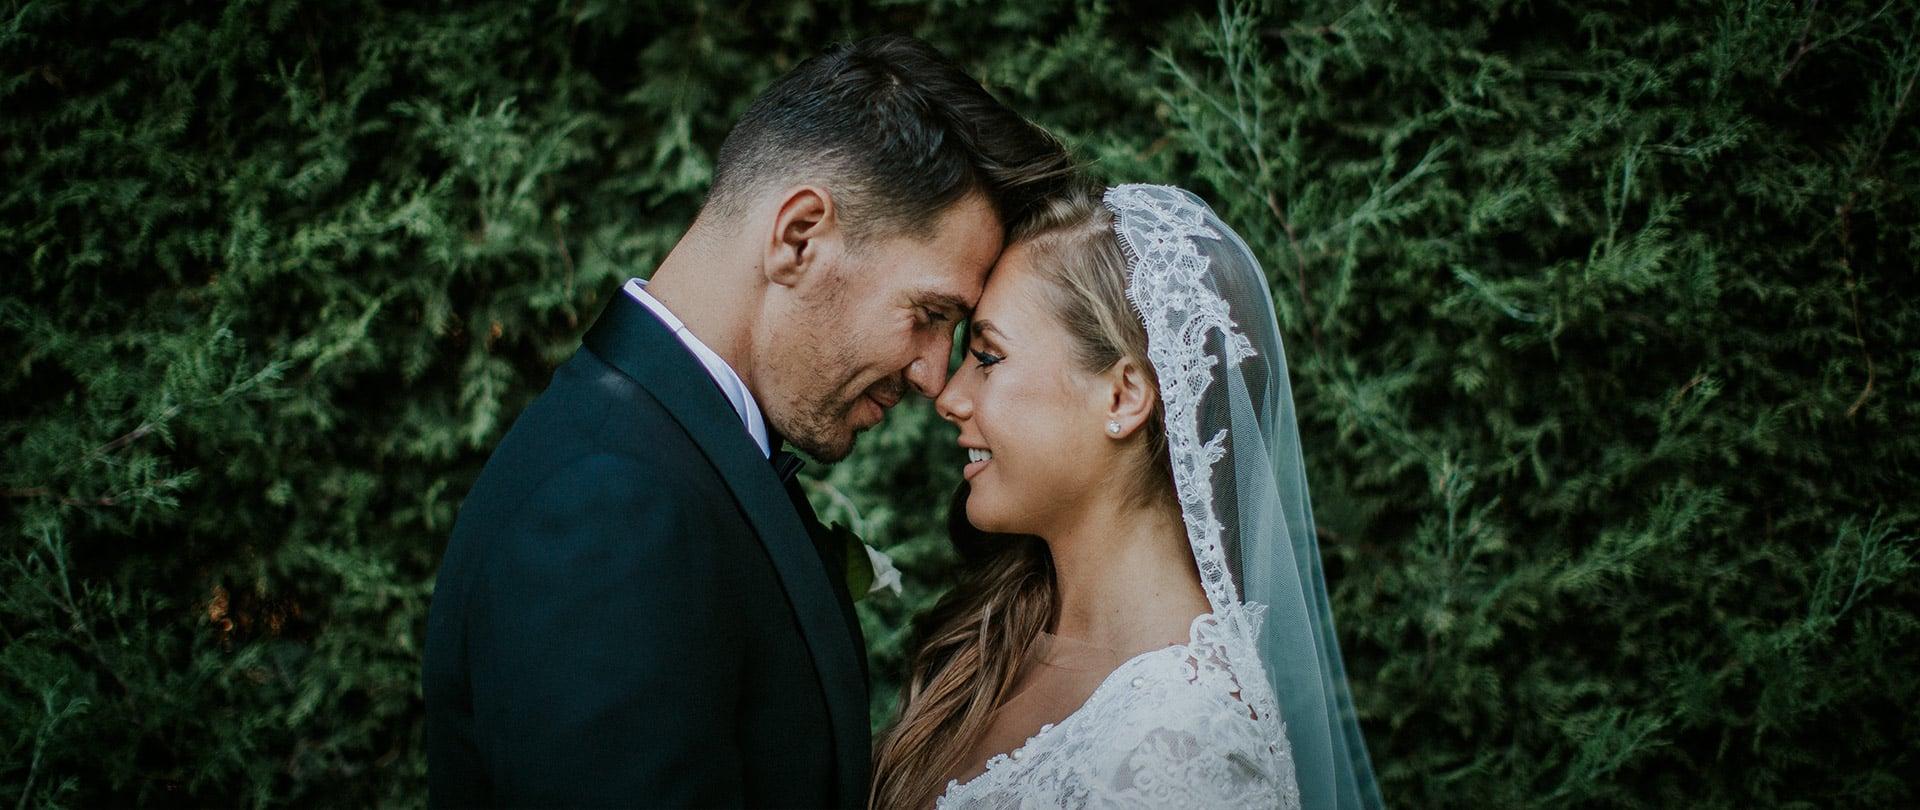 Emel & Ersan Wedding Video Filmed at Melbourne, Victoria